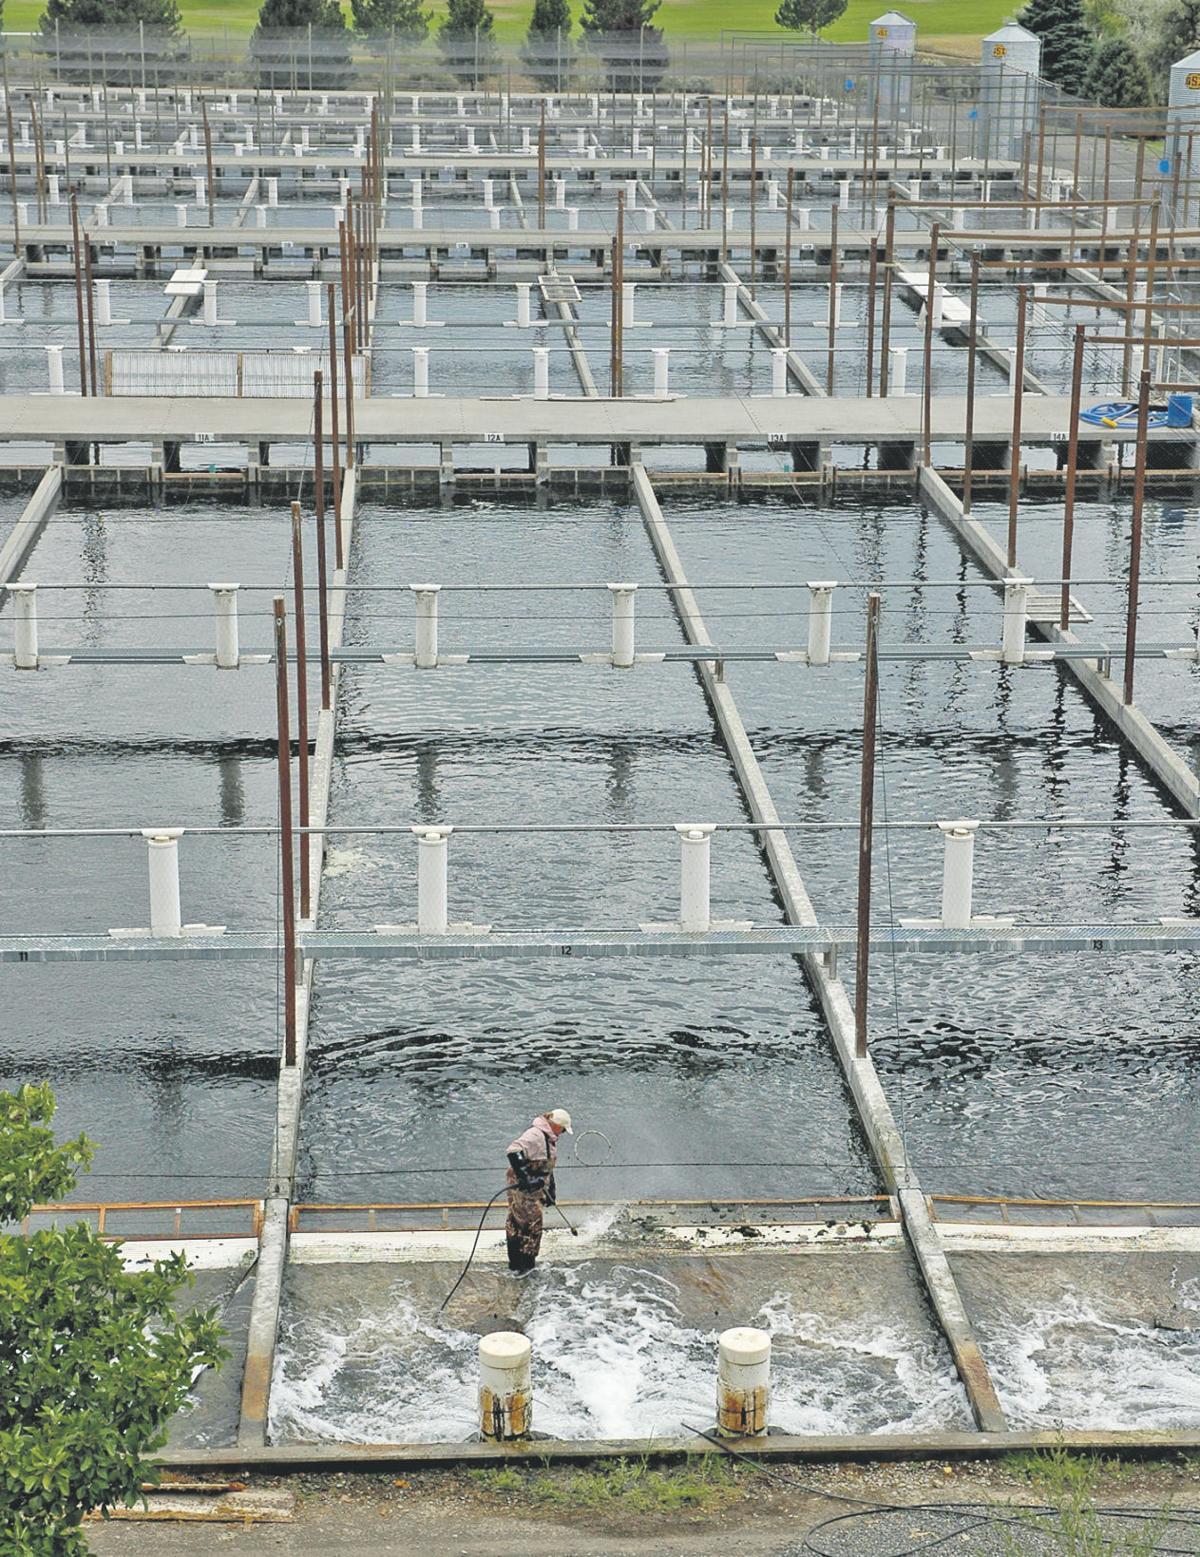 Water shortage bogs down trout farms